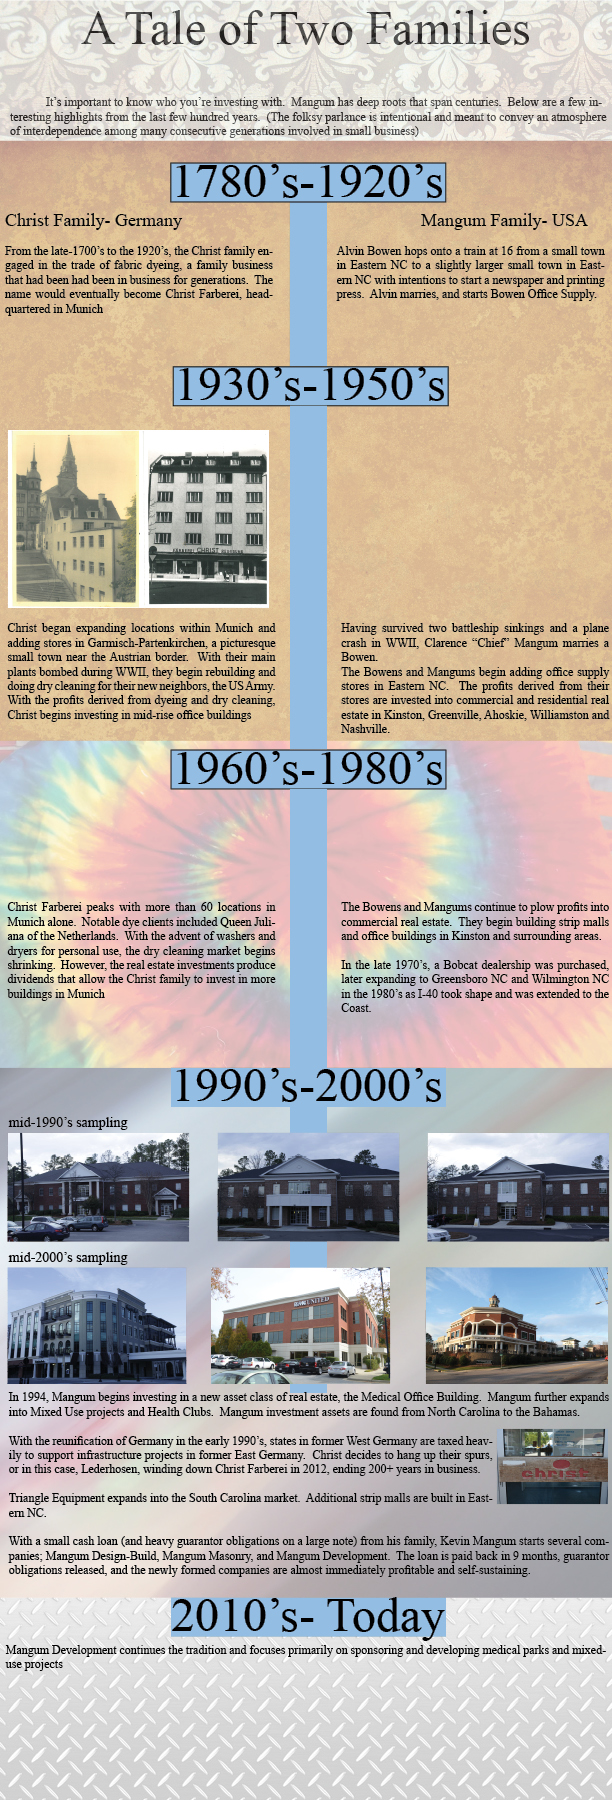 Mangum Timeline- History 1780-present